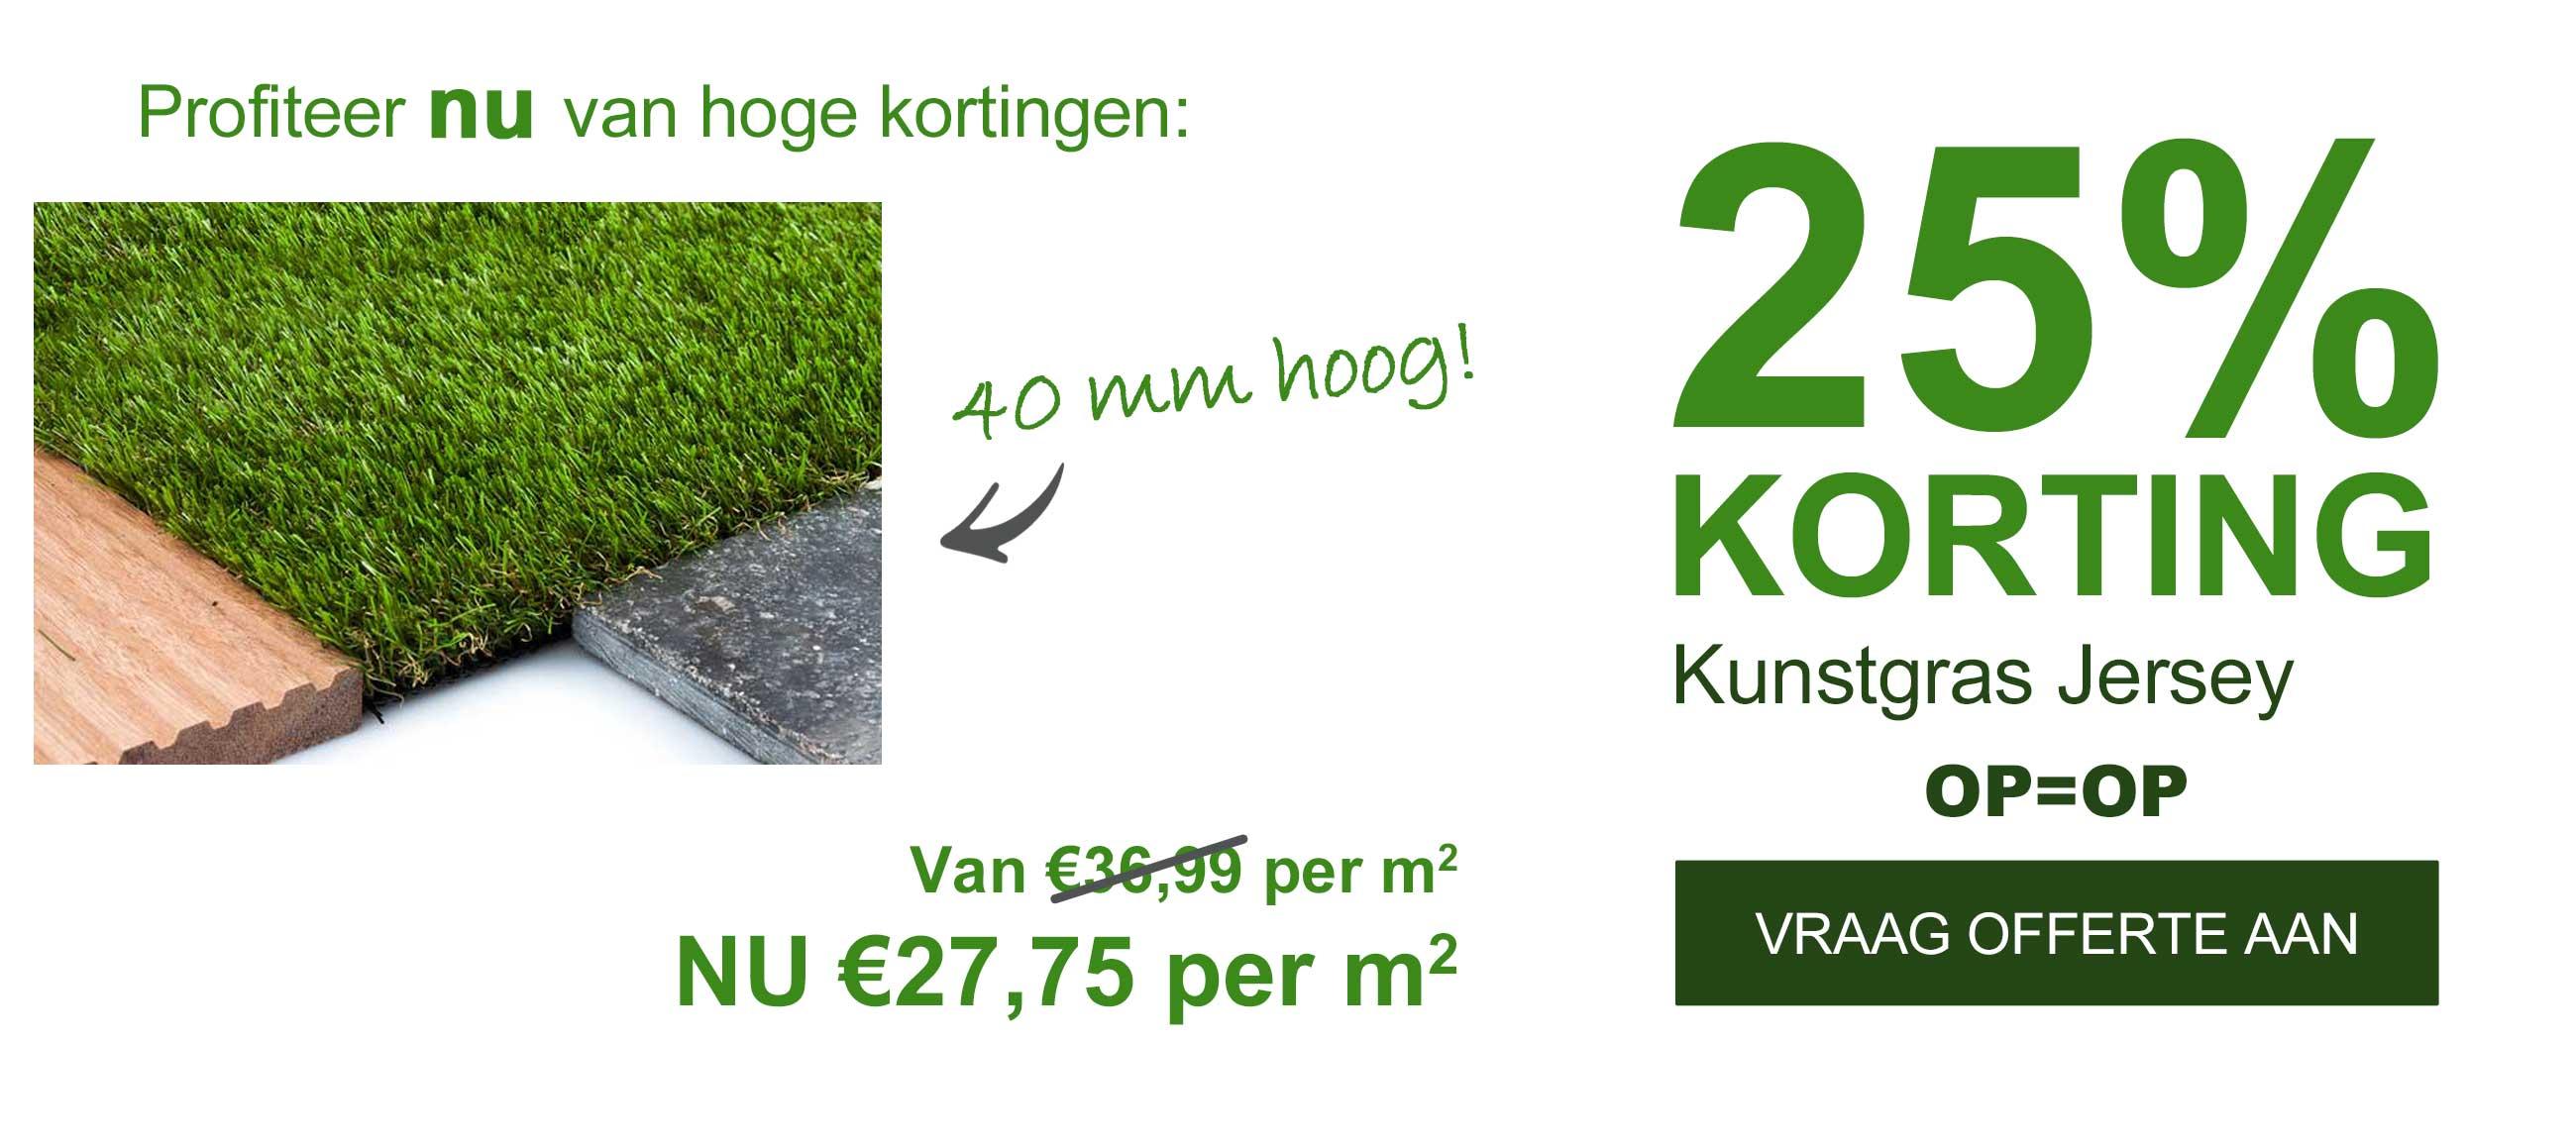 Kunstgras Jersey 40 Mm